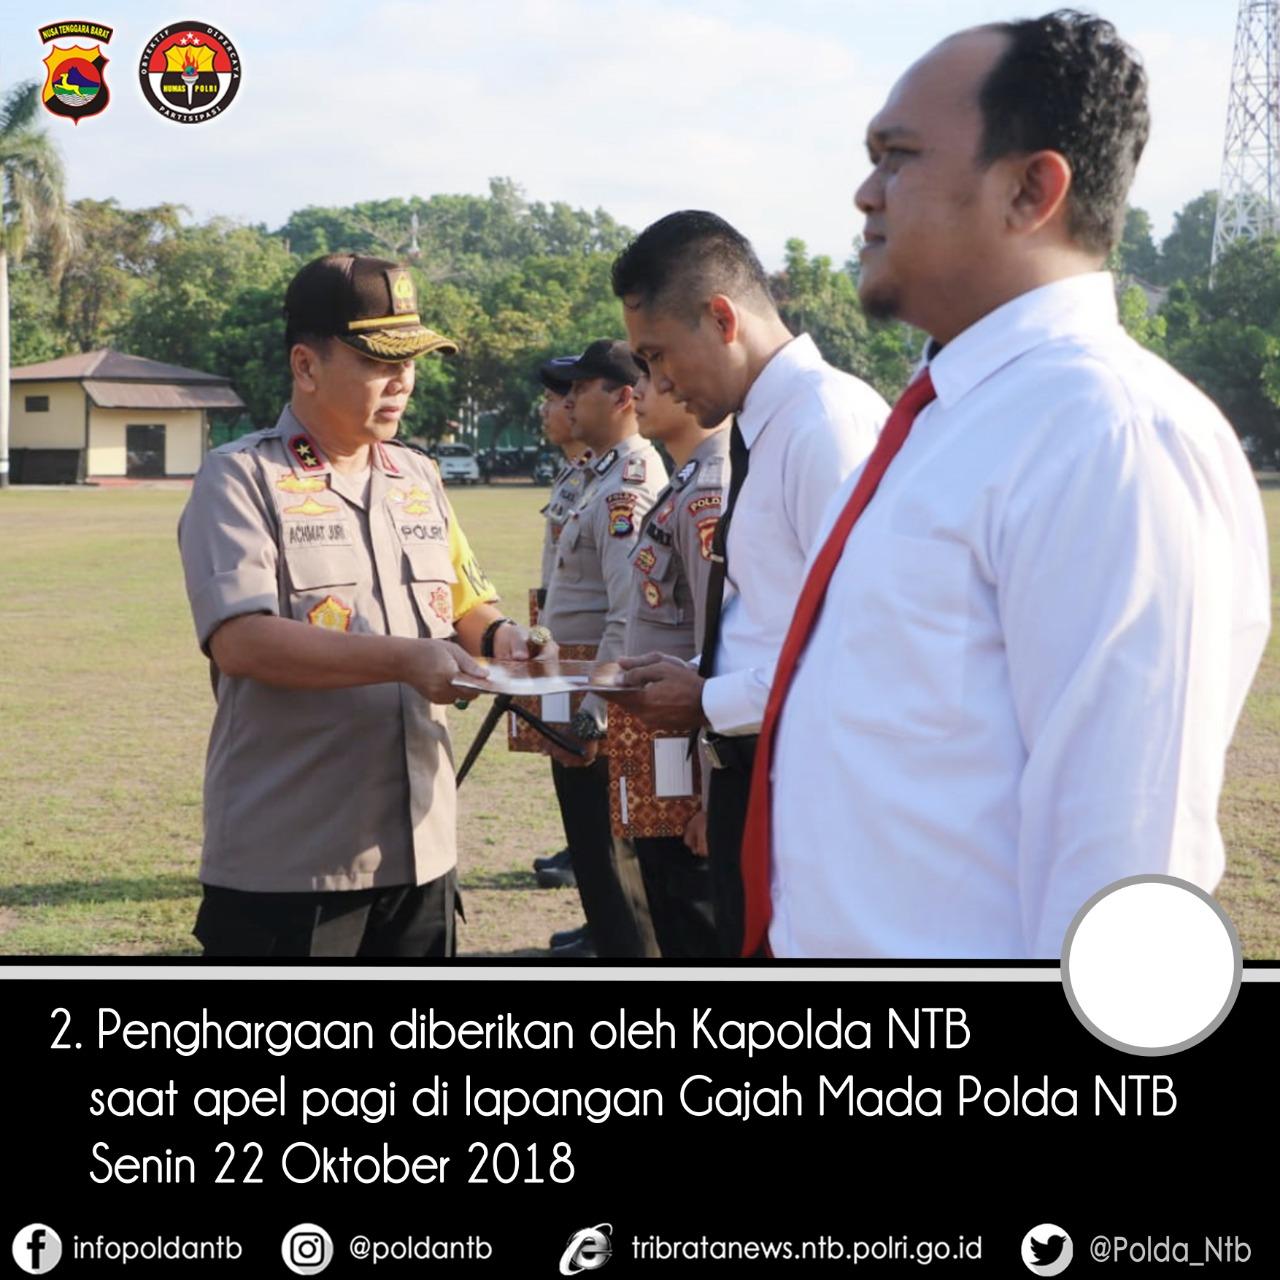 Kapolda NTB Berikan Penghargaan Anggota Yang Berhasil Evakuasi Korban Gempa Lombo 2018